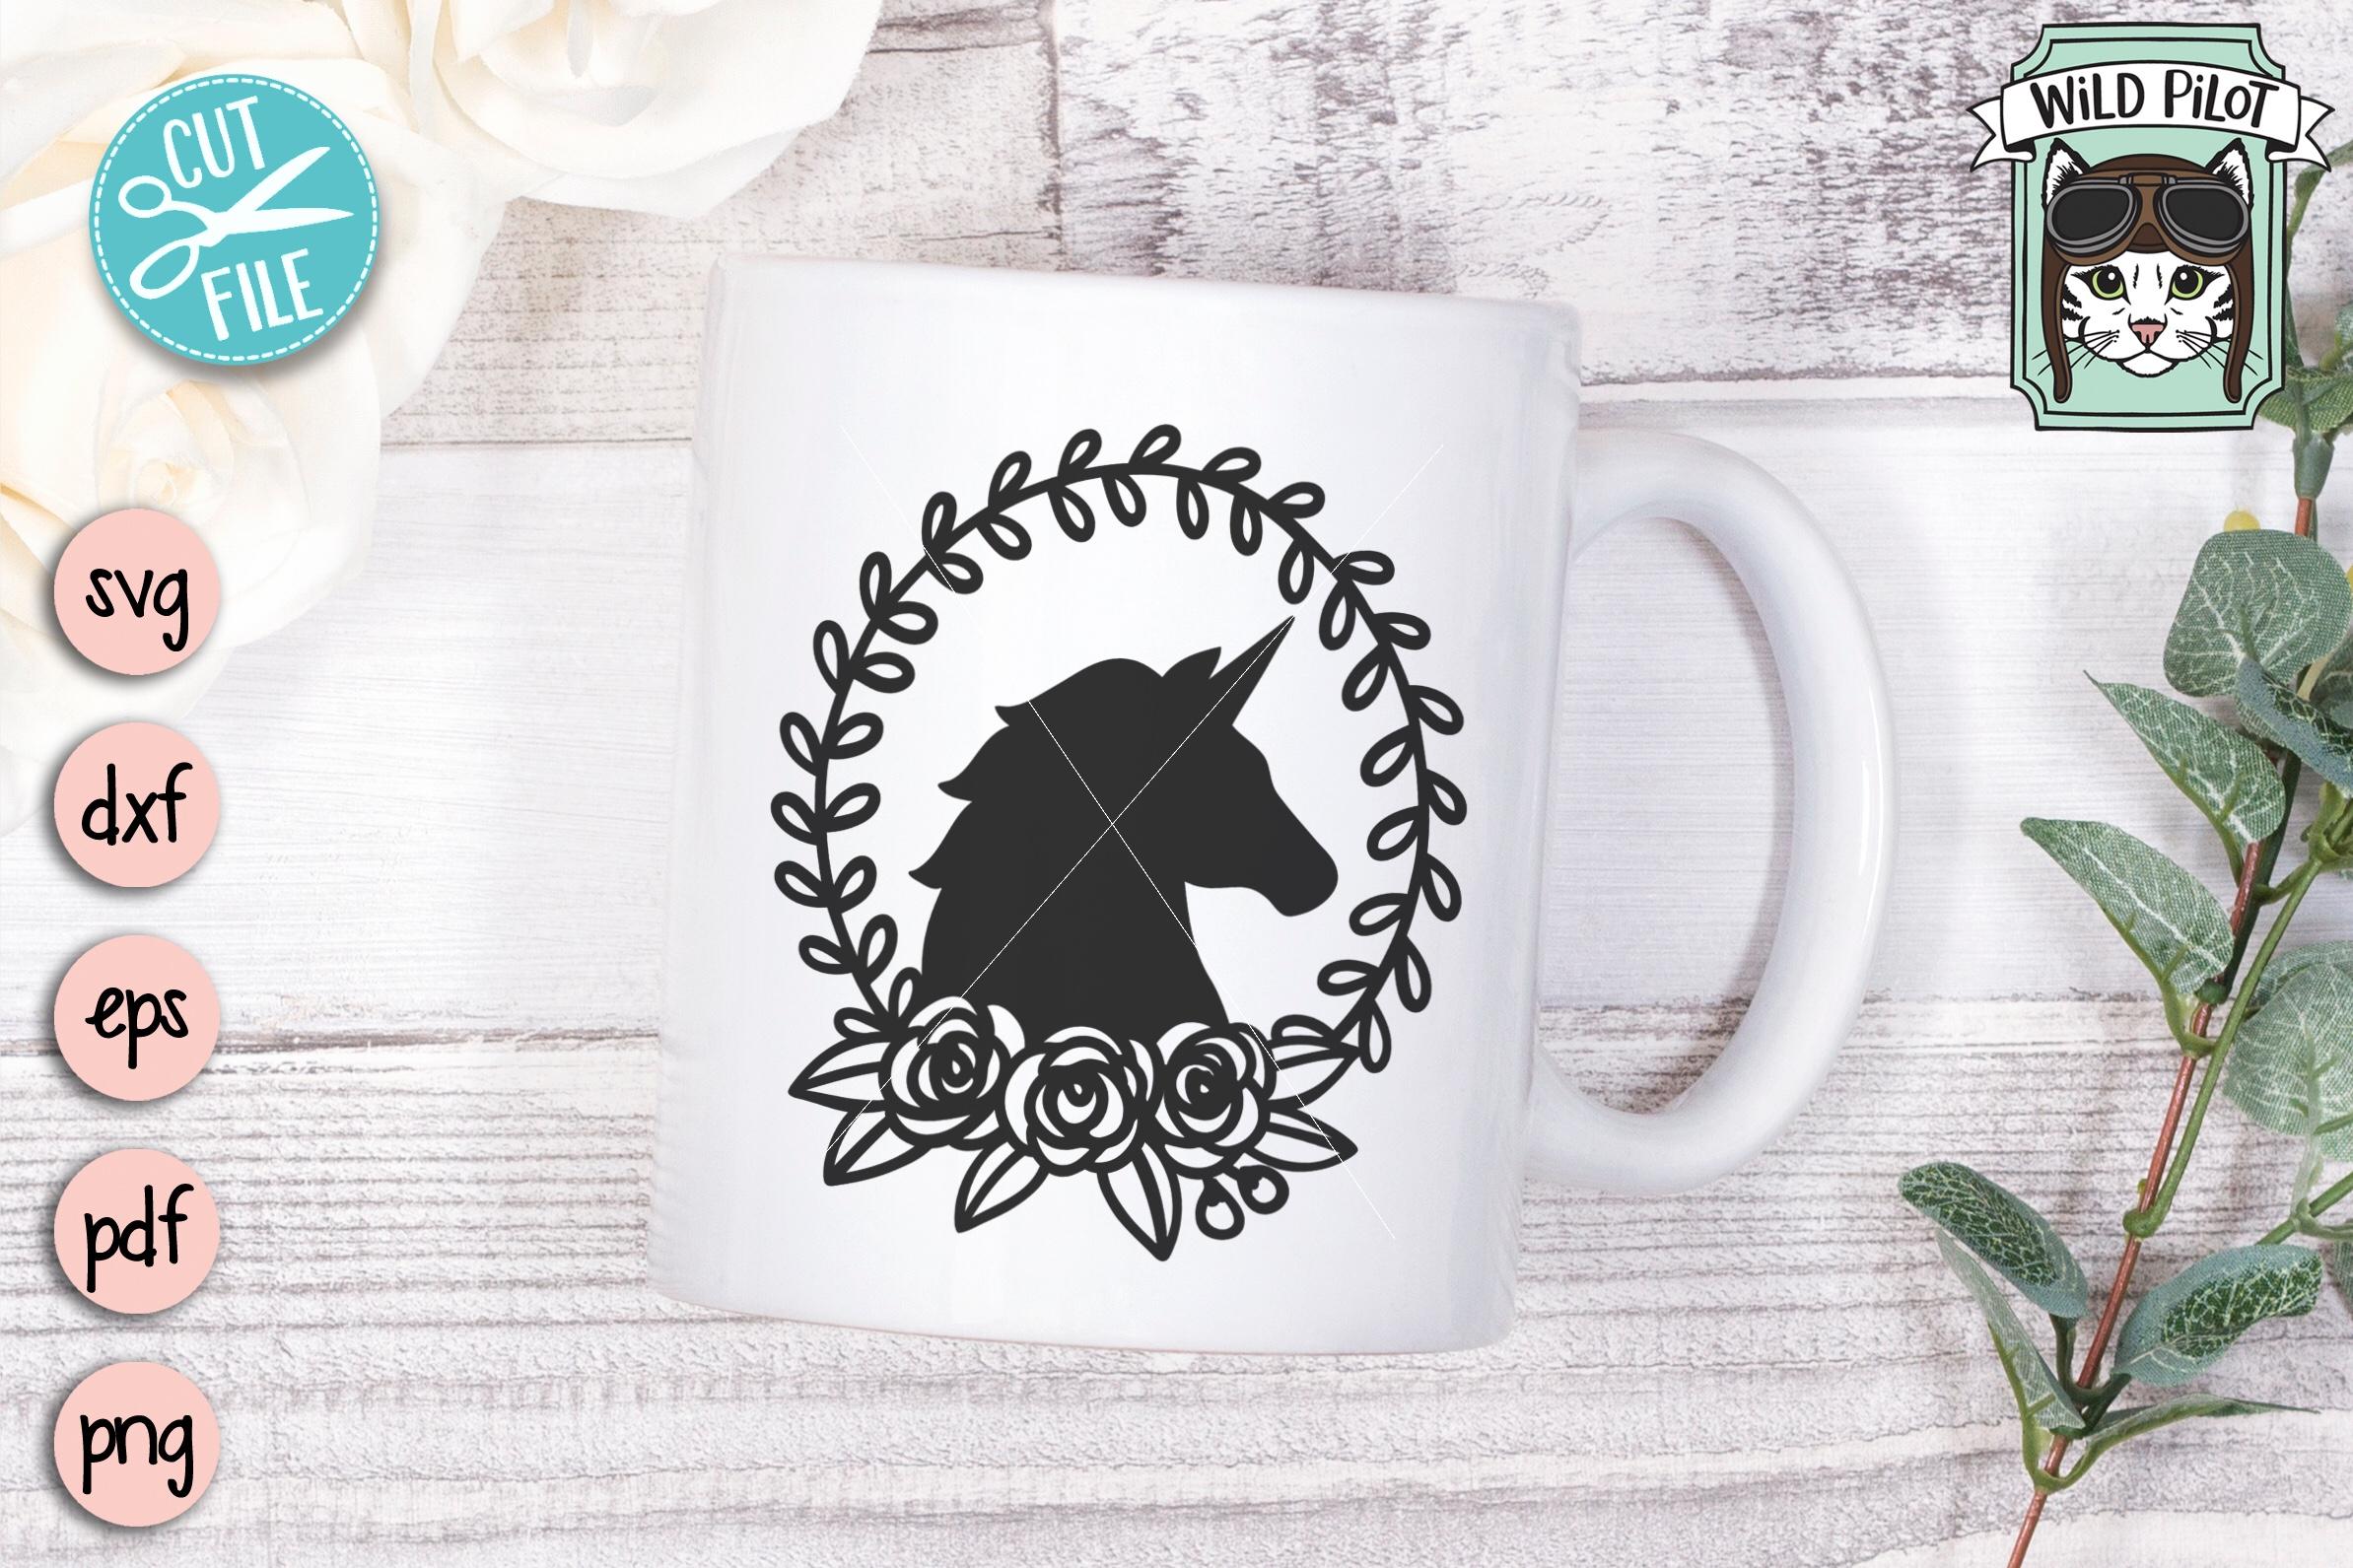 Unicorn SVG file, Unicorn Silhouette, Unicorn Wreath example image 3